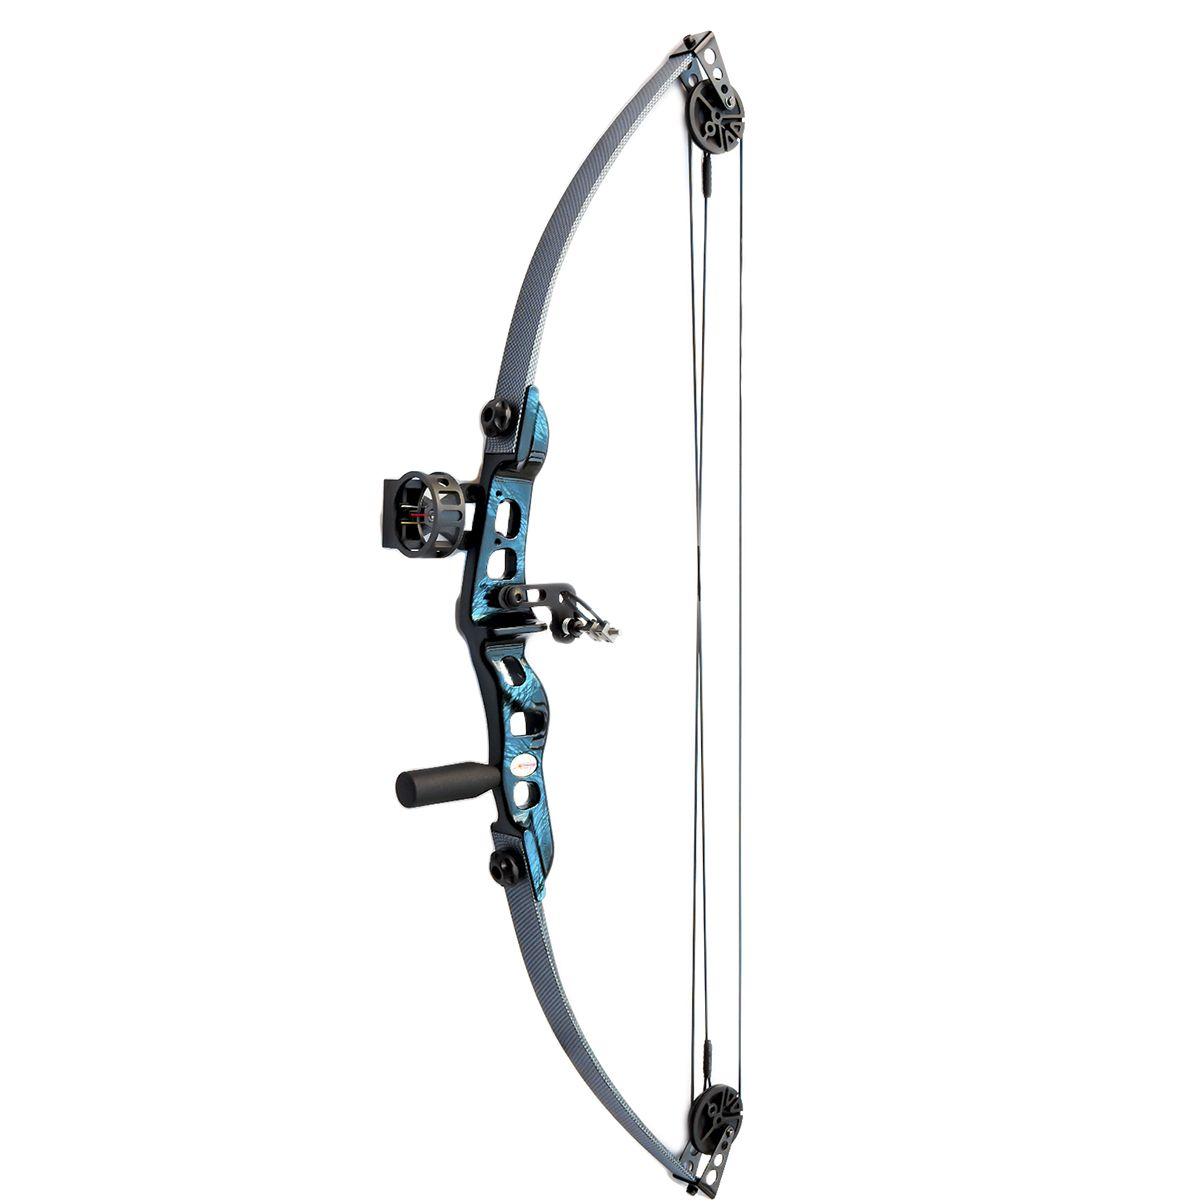 Arco e flecha Catfish Vixion kit plus Composto + Mira MK-Sight + Rest B10002K + Estabilizador EST1